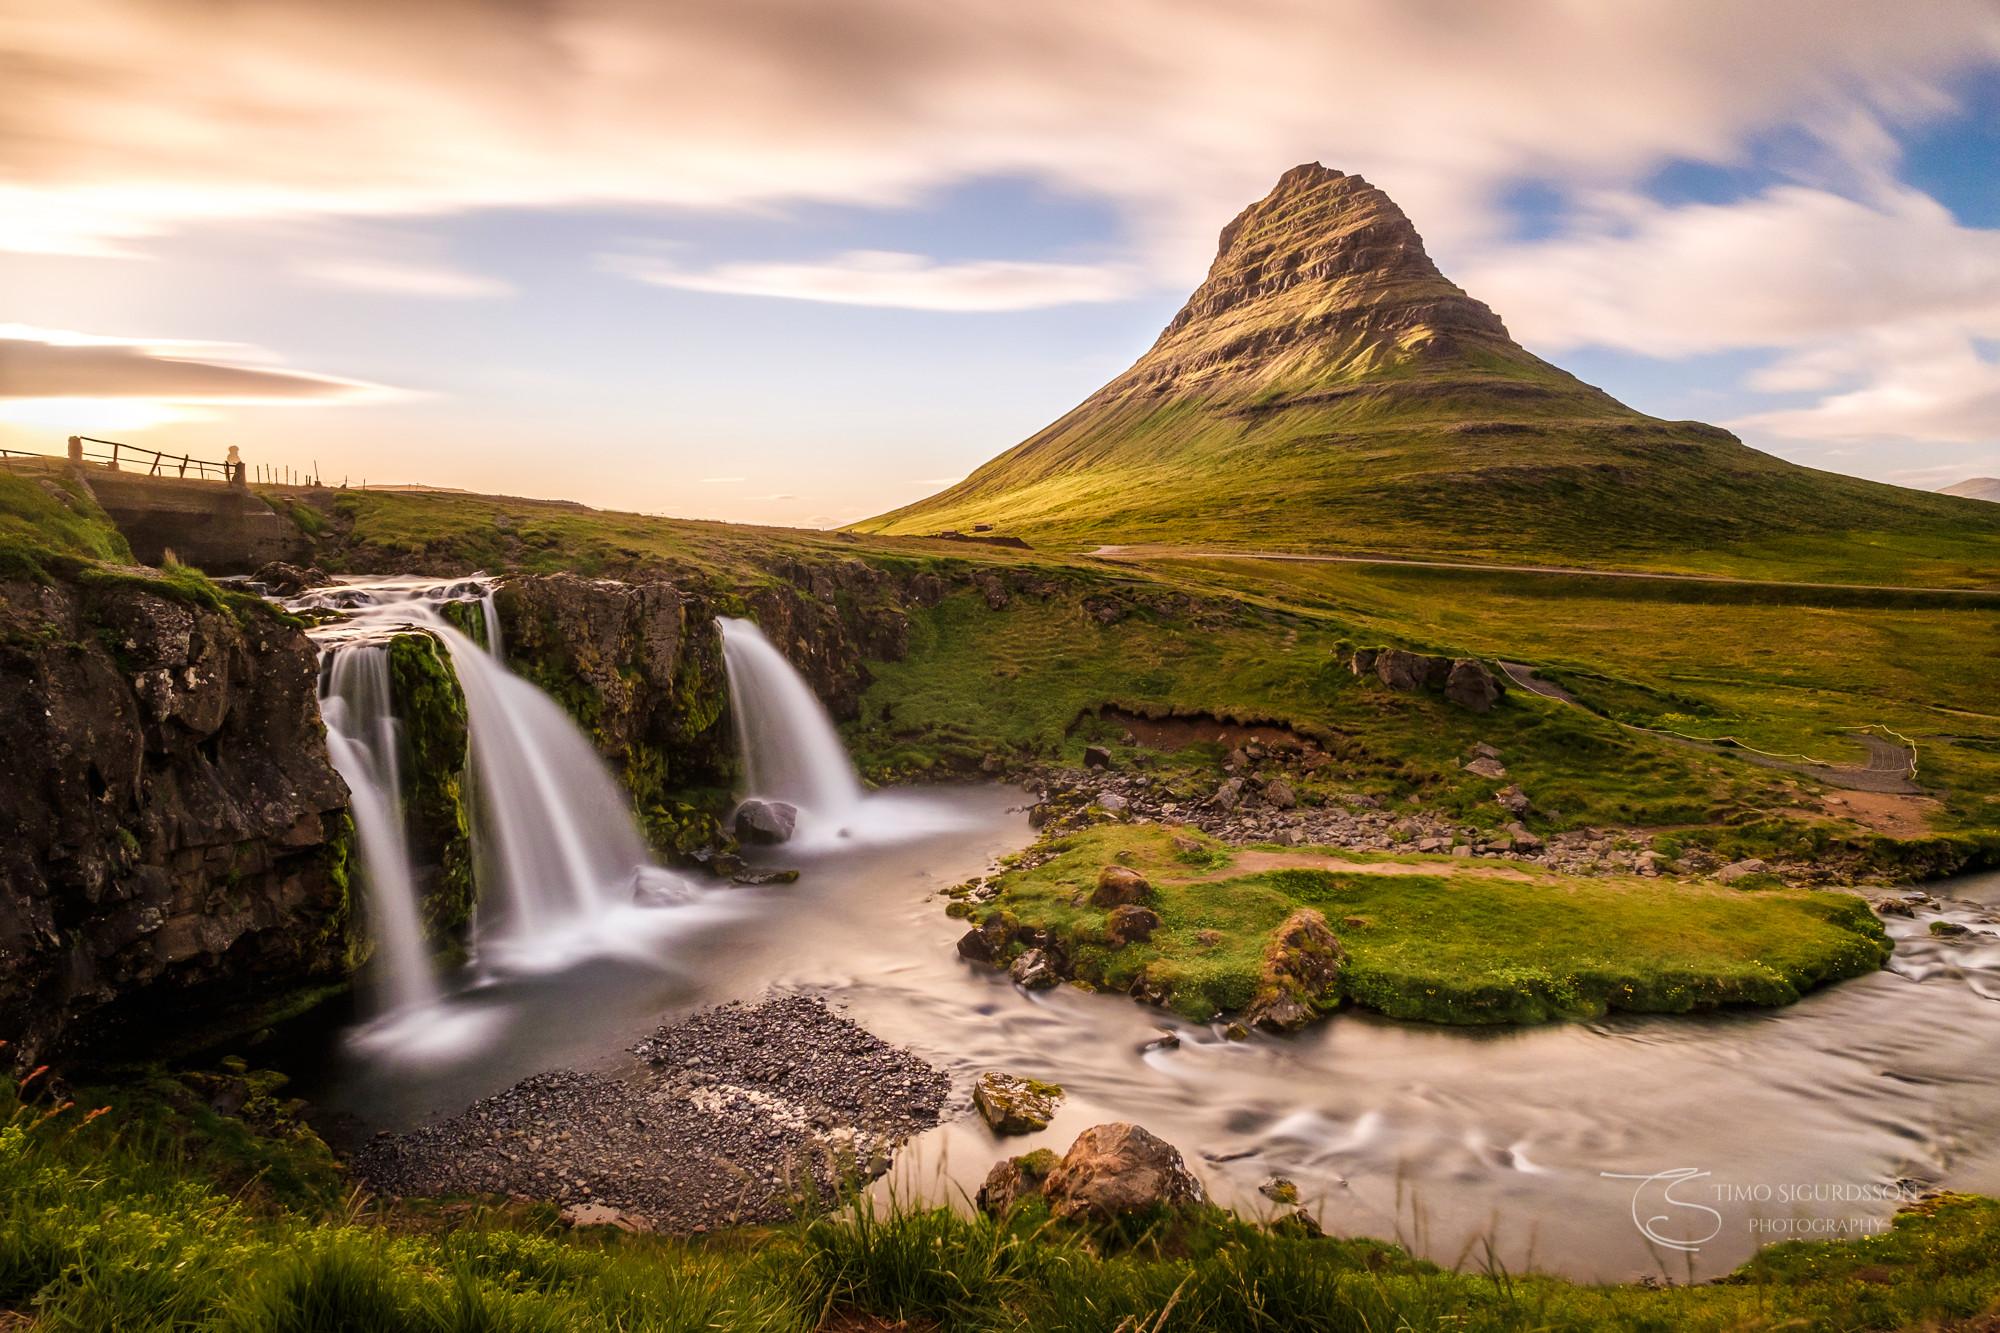 Grundarfjörður, Iceland. Kirkjufell mountain behind Kirkjufellsfoss waterfalls at dusk.